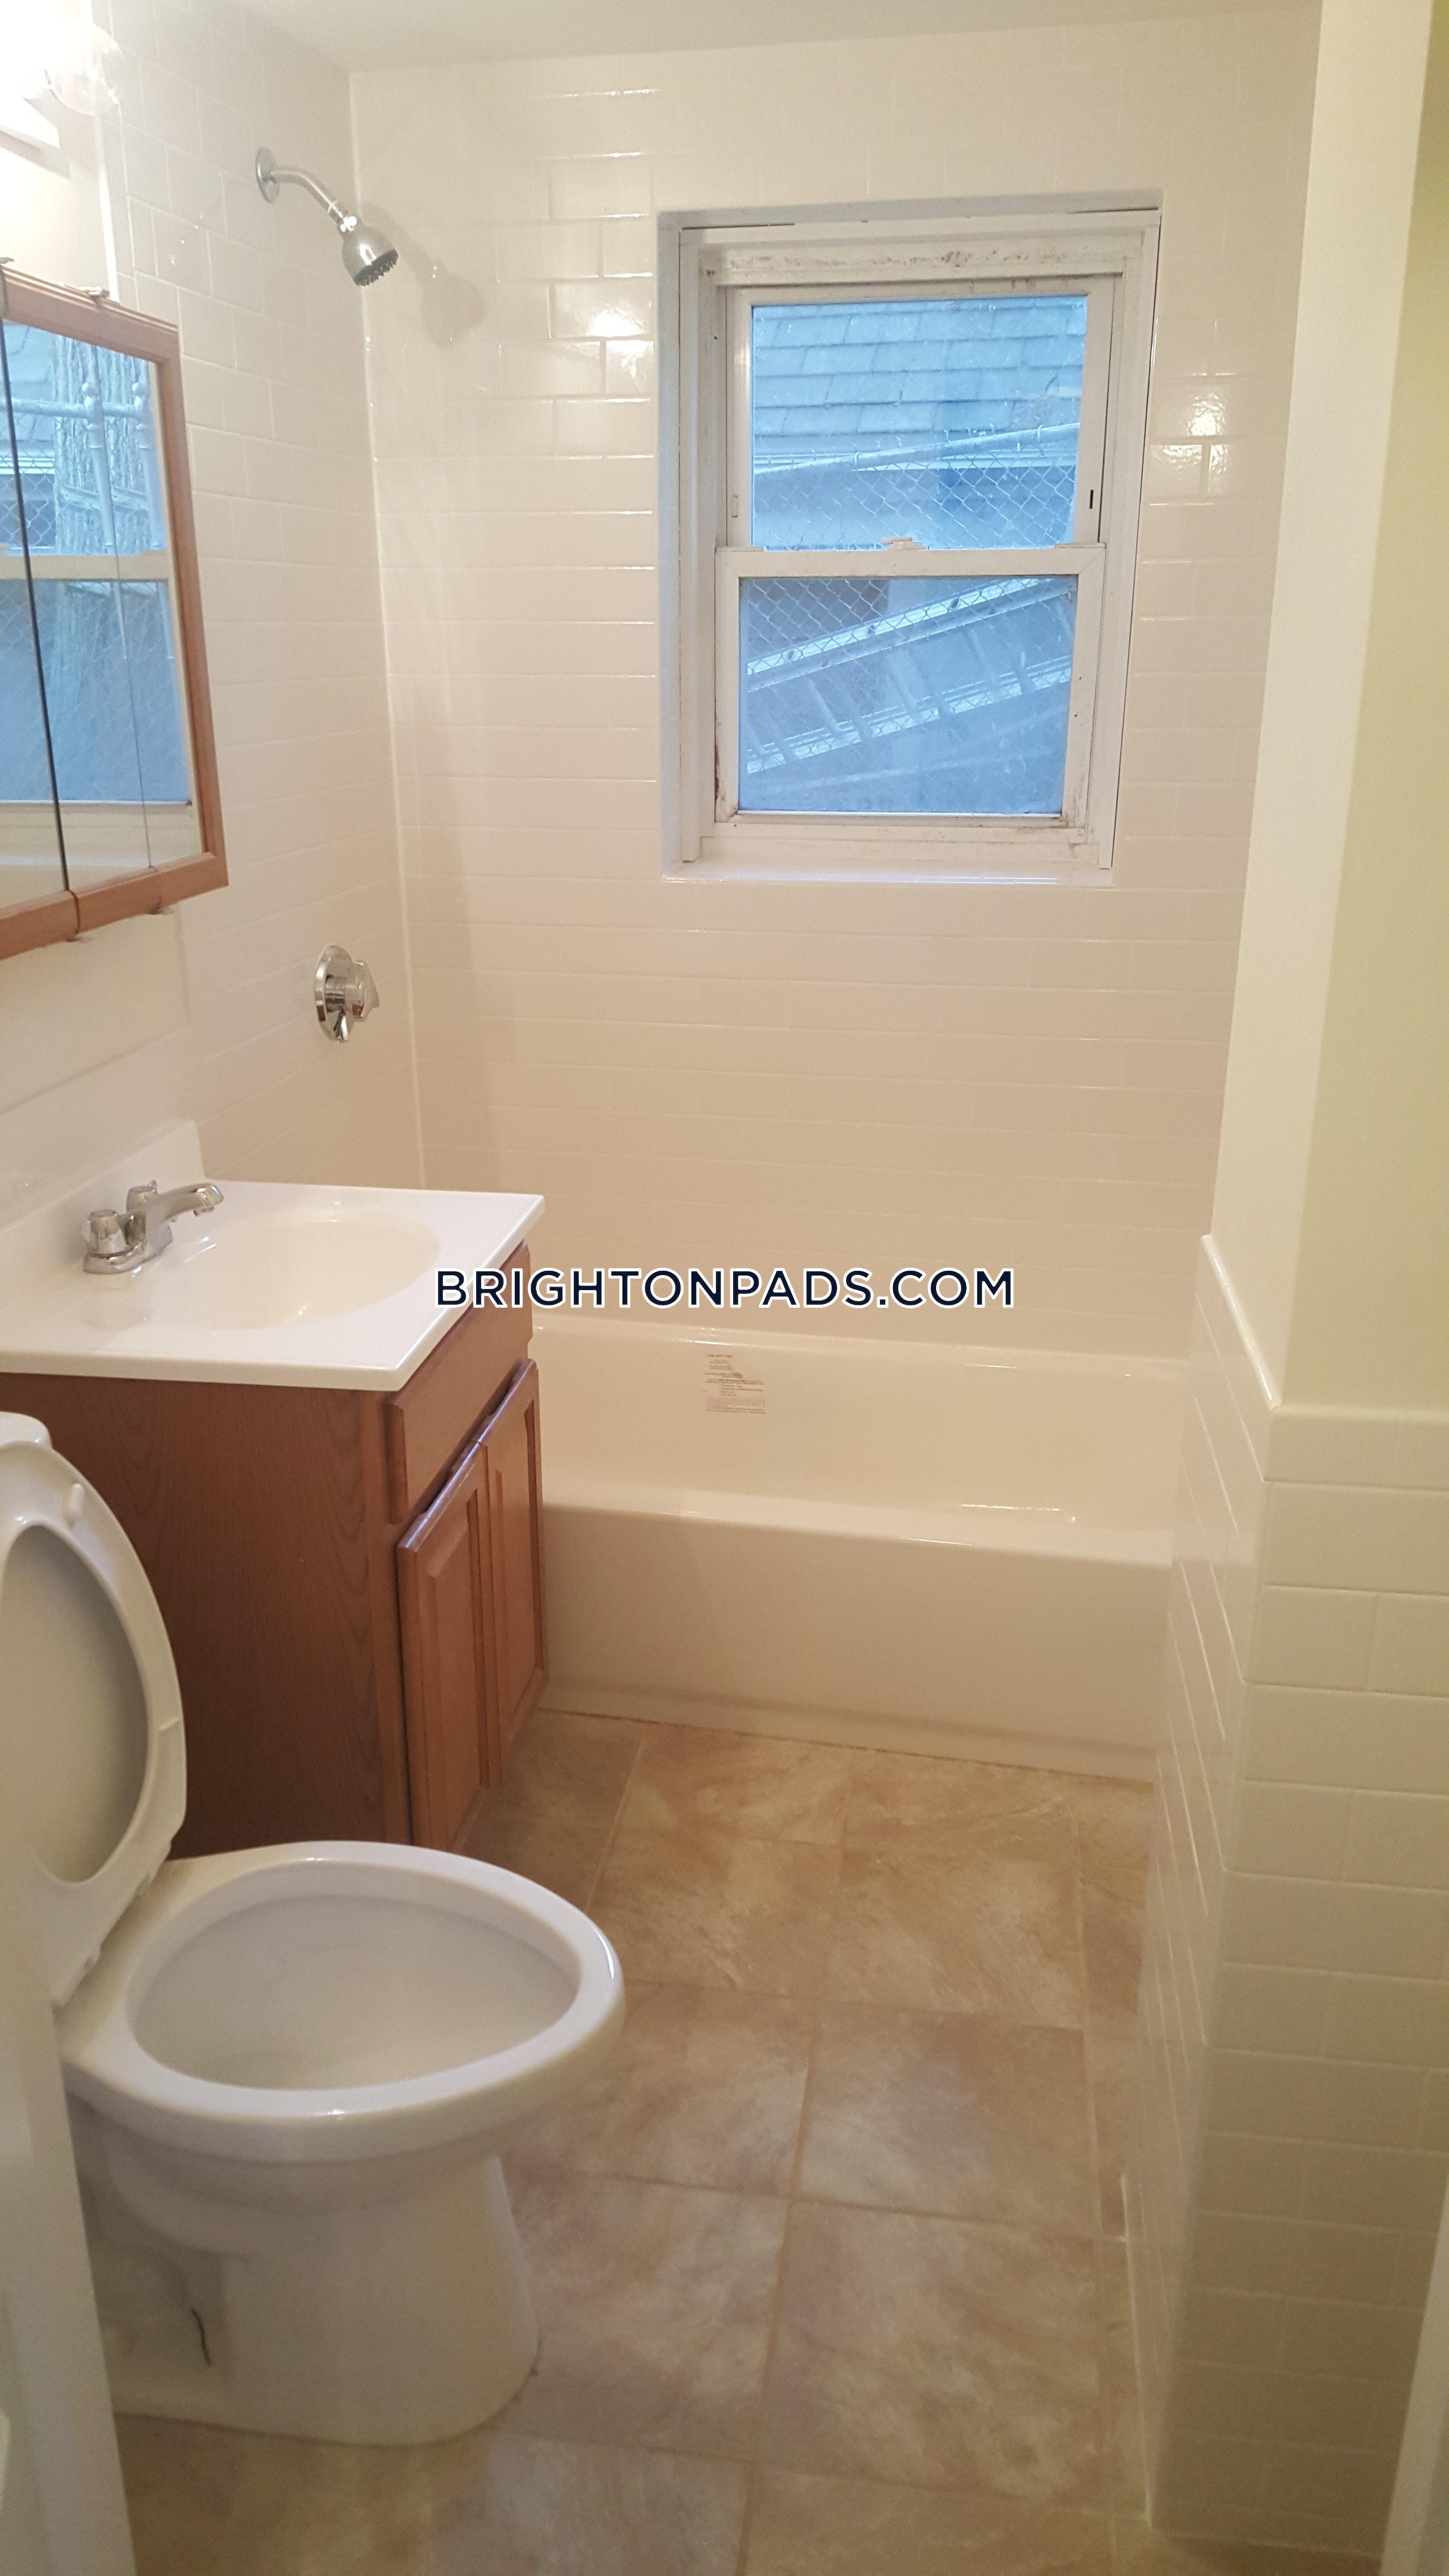 2-beds-1-bath-boston-brighton-cleveland-circle-2295-453460